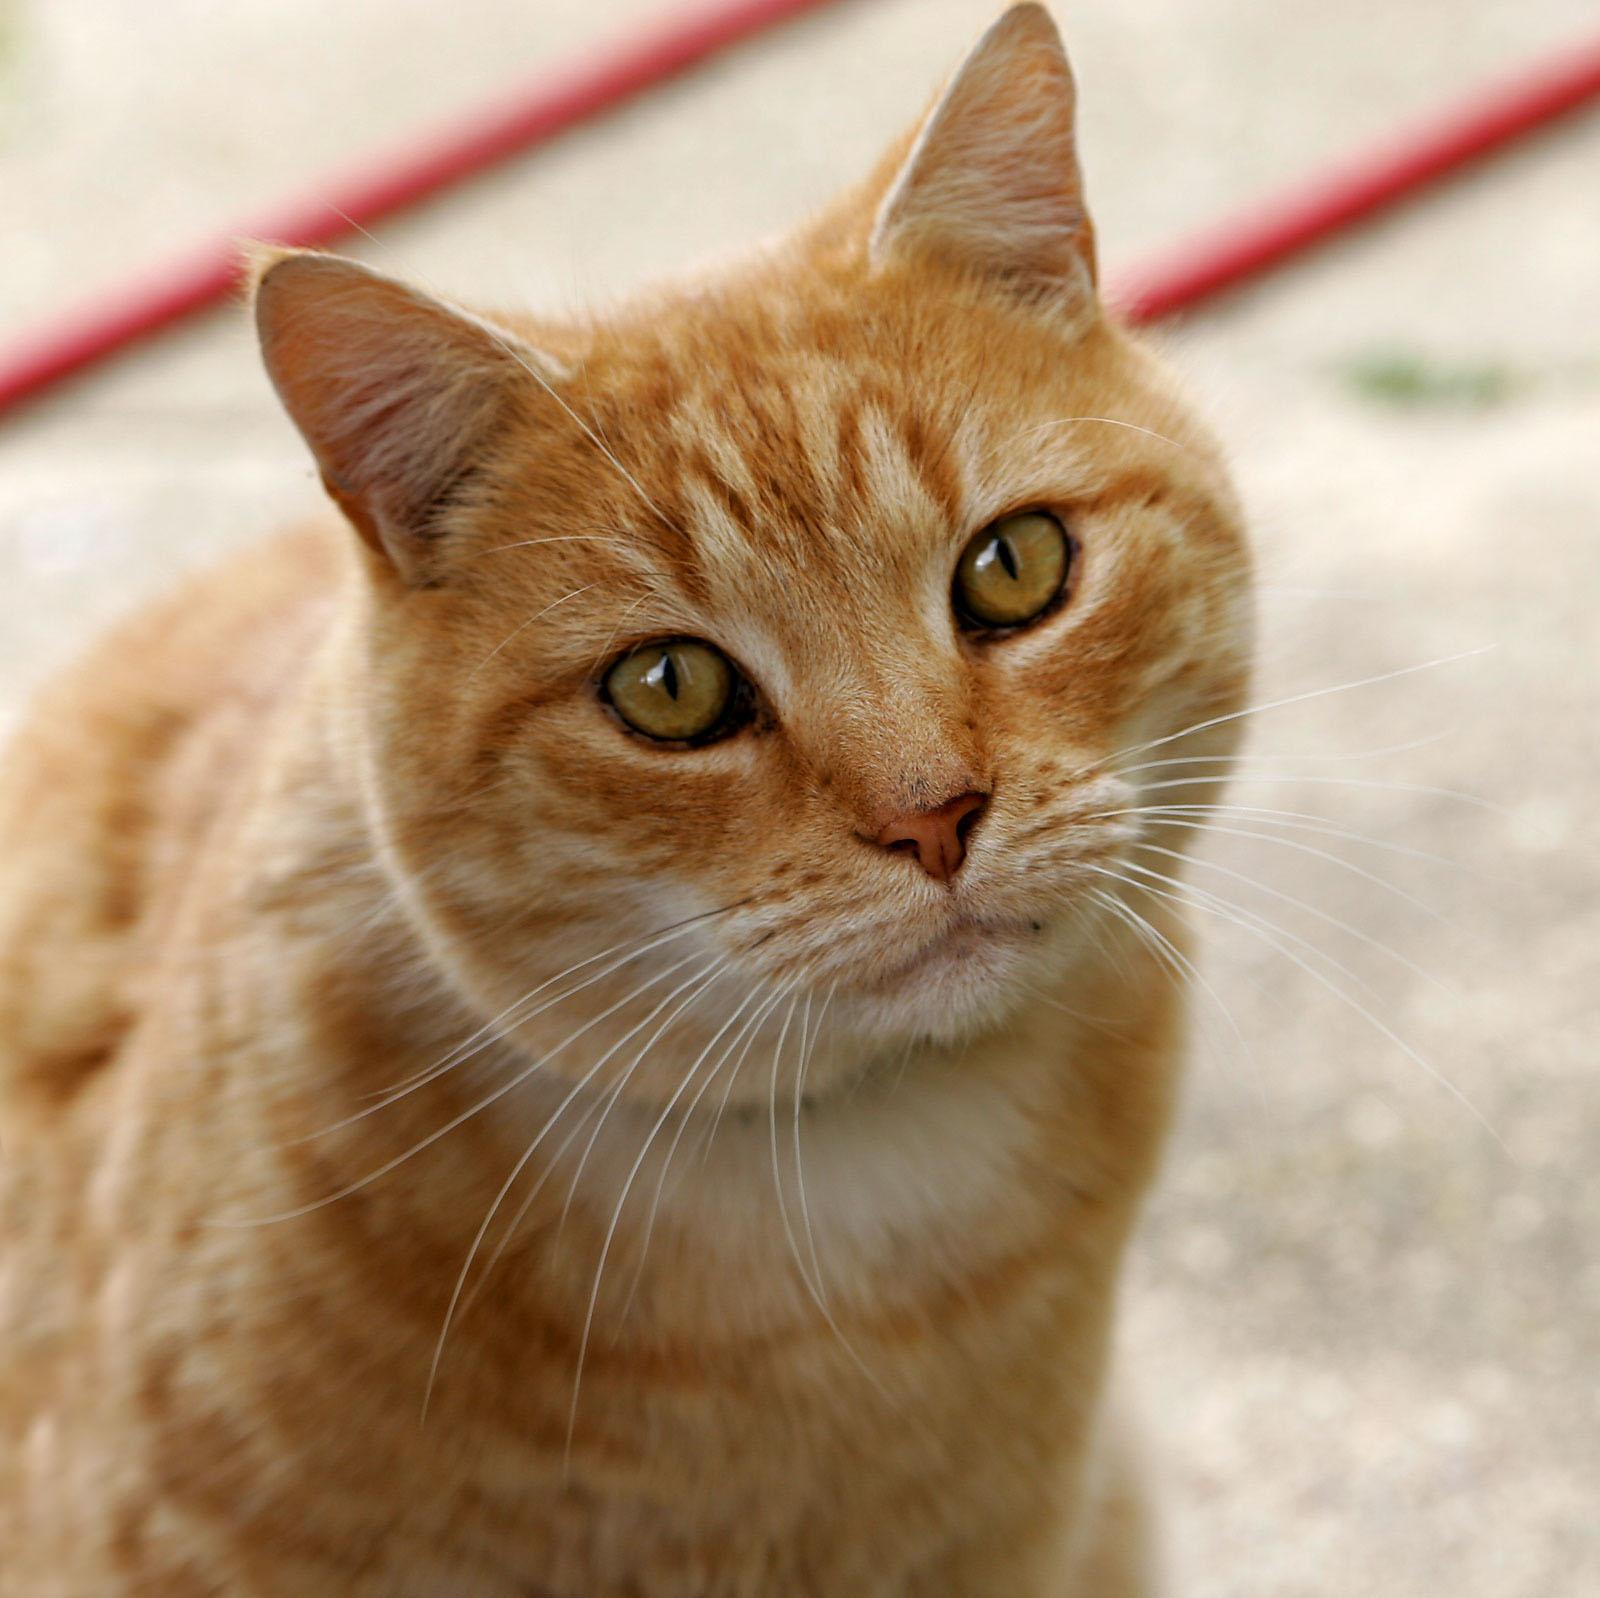 Kucing is Meong